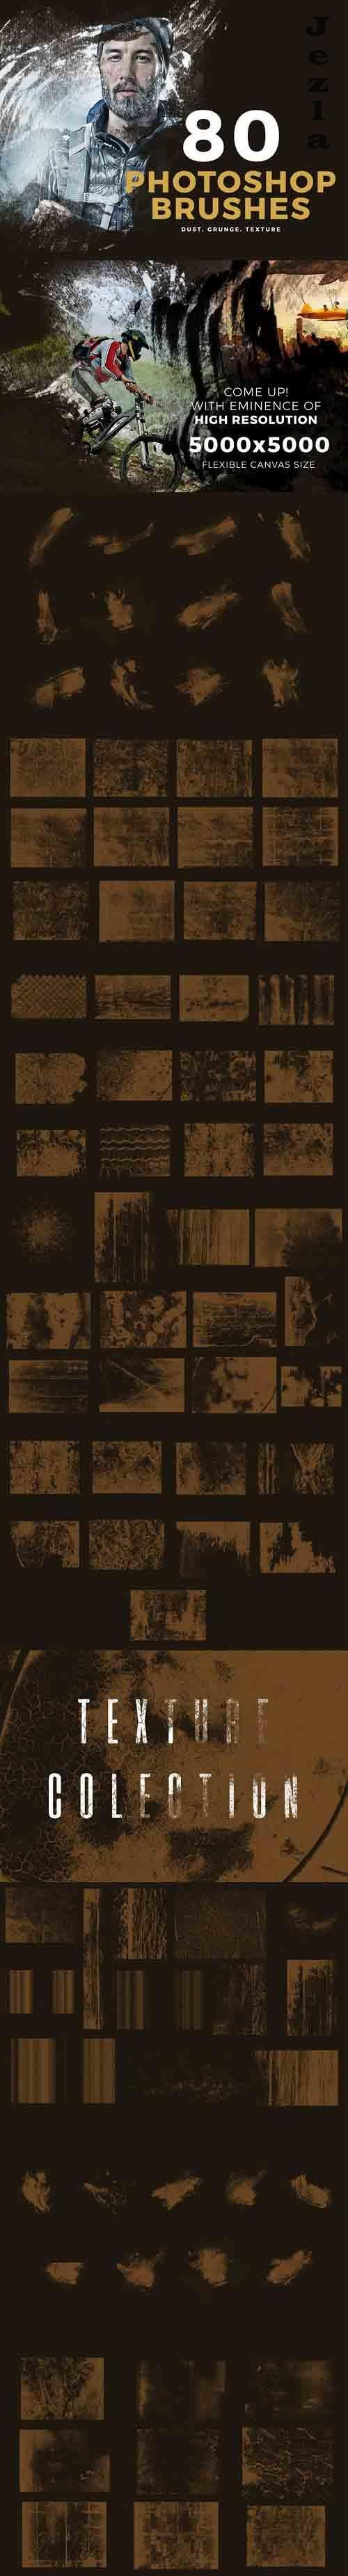 80 PHSP Brushes - 2499810 - Dust, Grunge, Texture, Wood